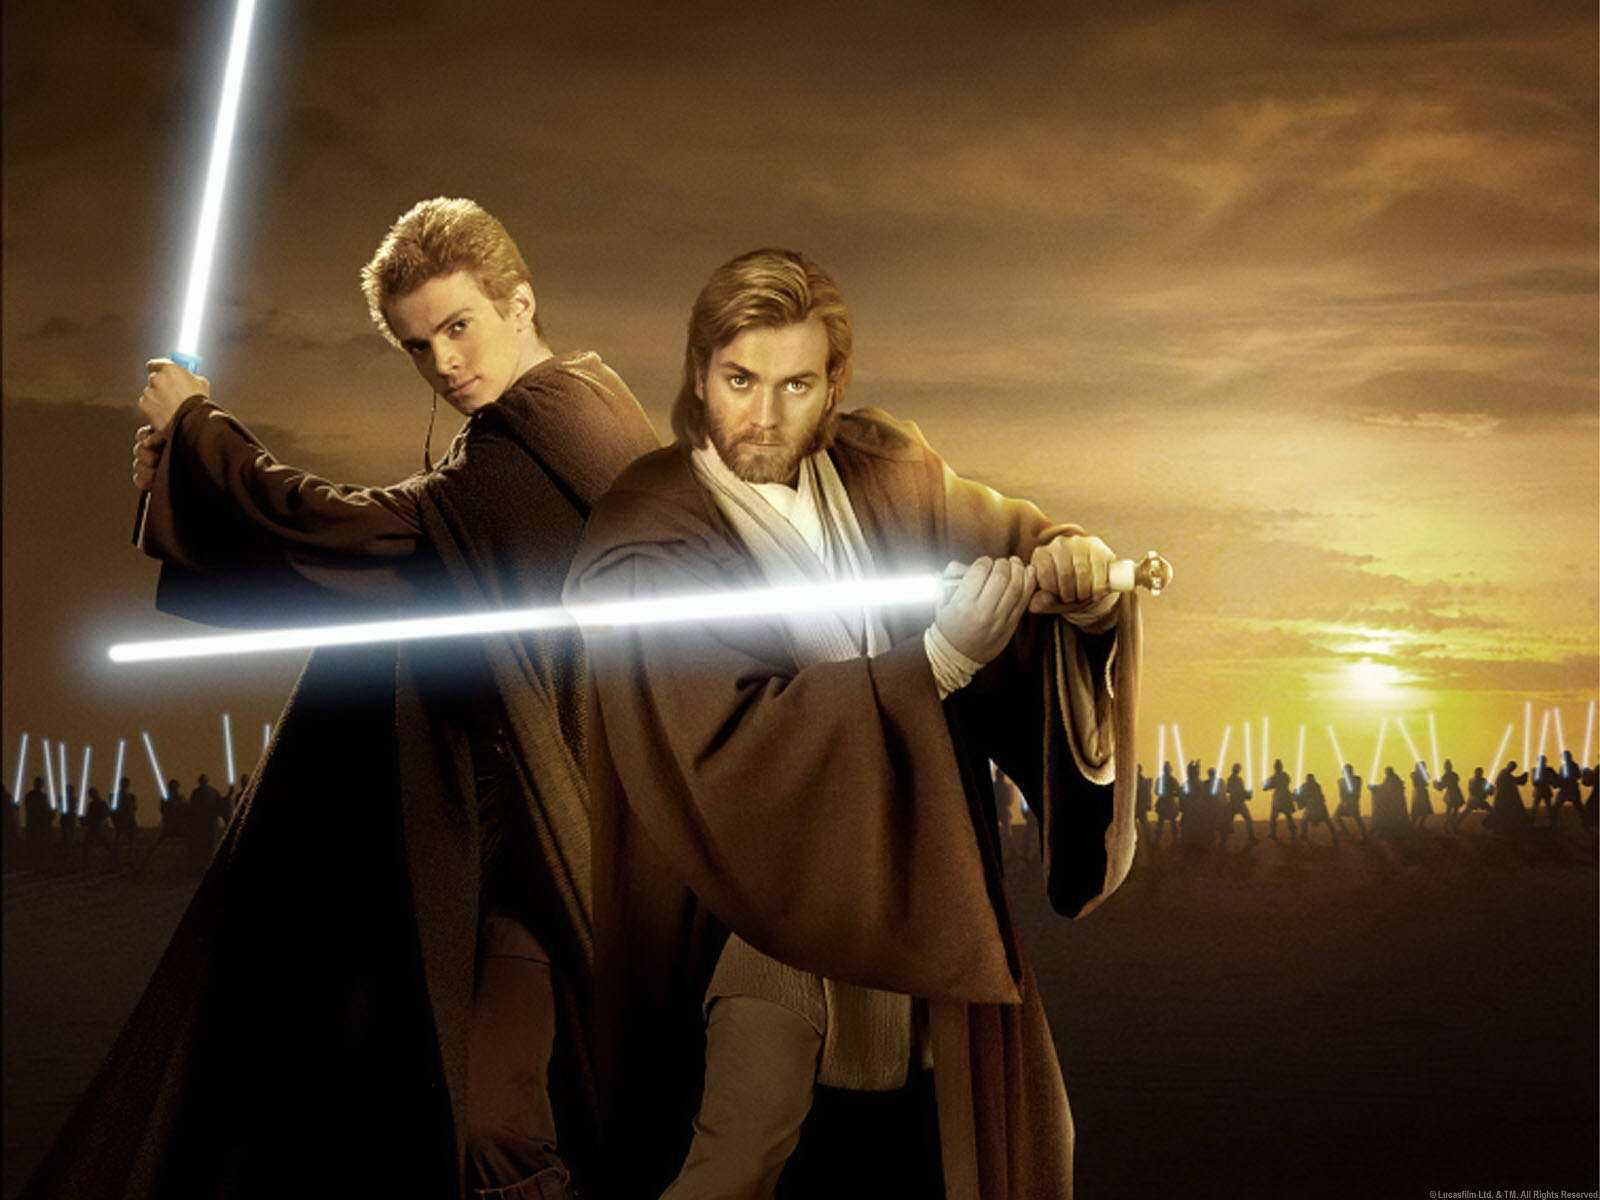 Anakin and Obi wan obi wan kenobi and Anakin skywalker Wallpaper 1600x1200